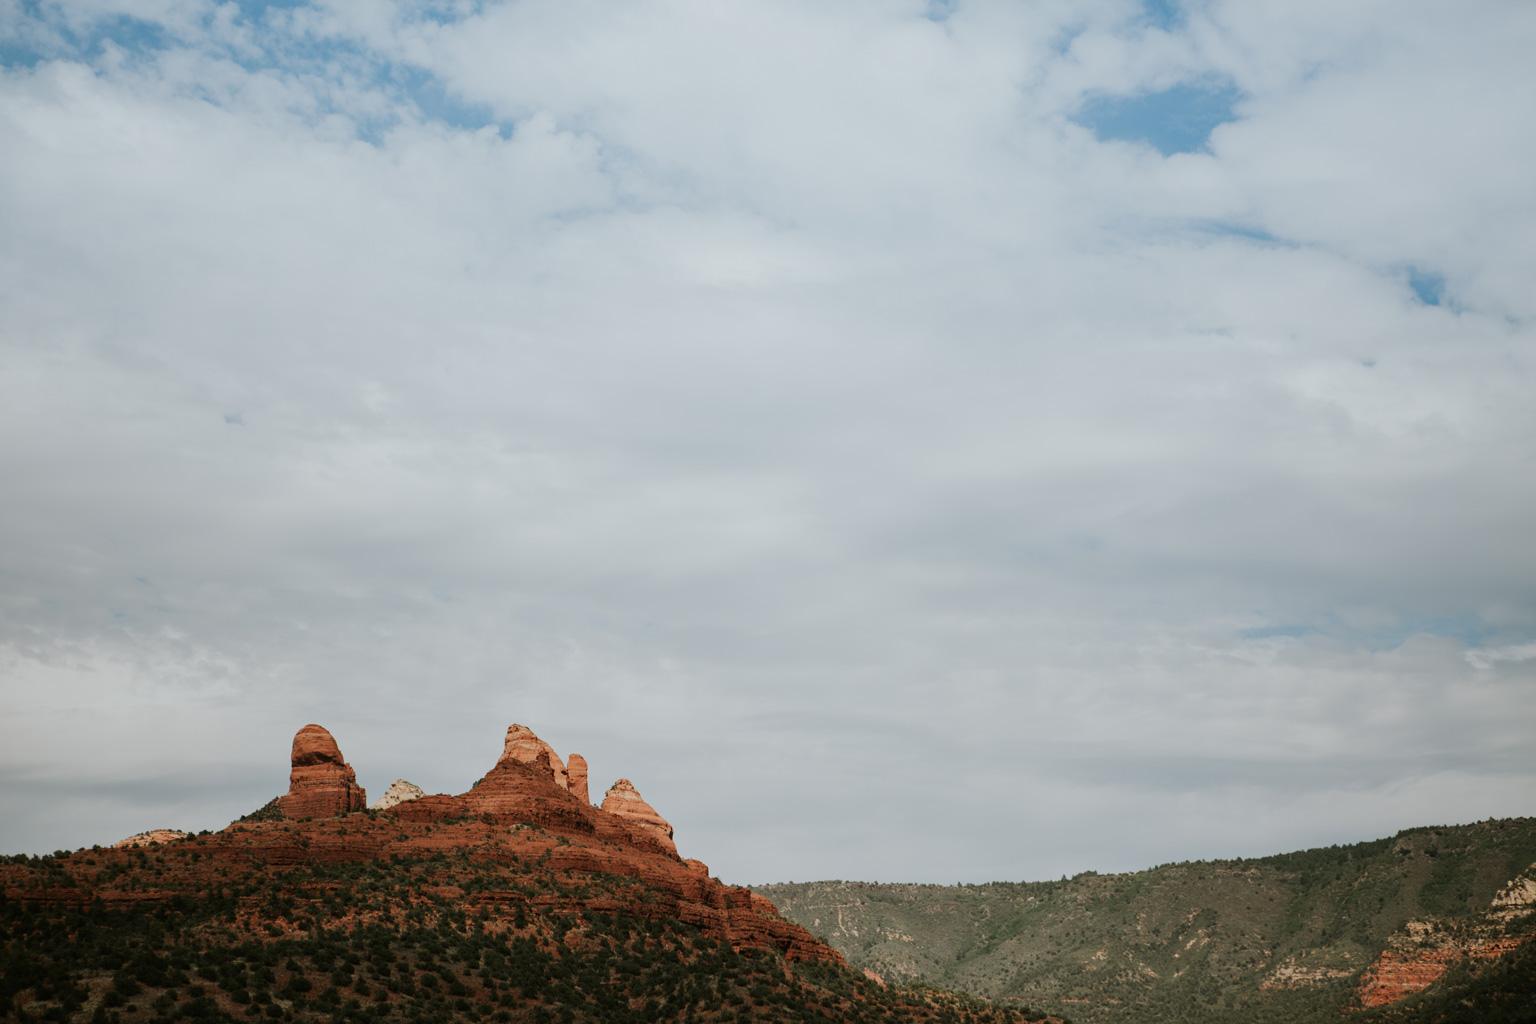 CindyGiovagnoli_Arizona_Sedona_camper_camping_road_trip_travel-003.jpg